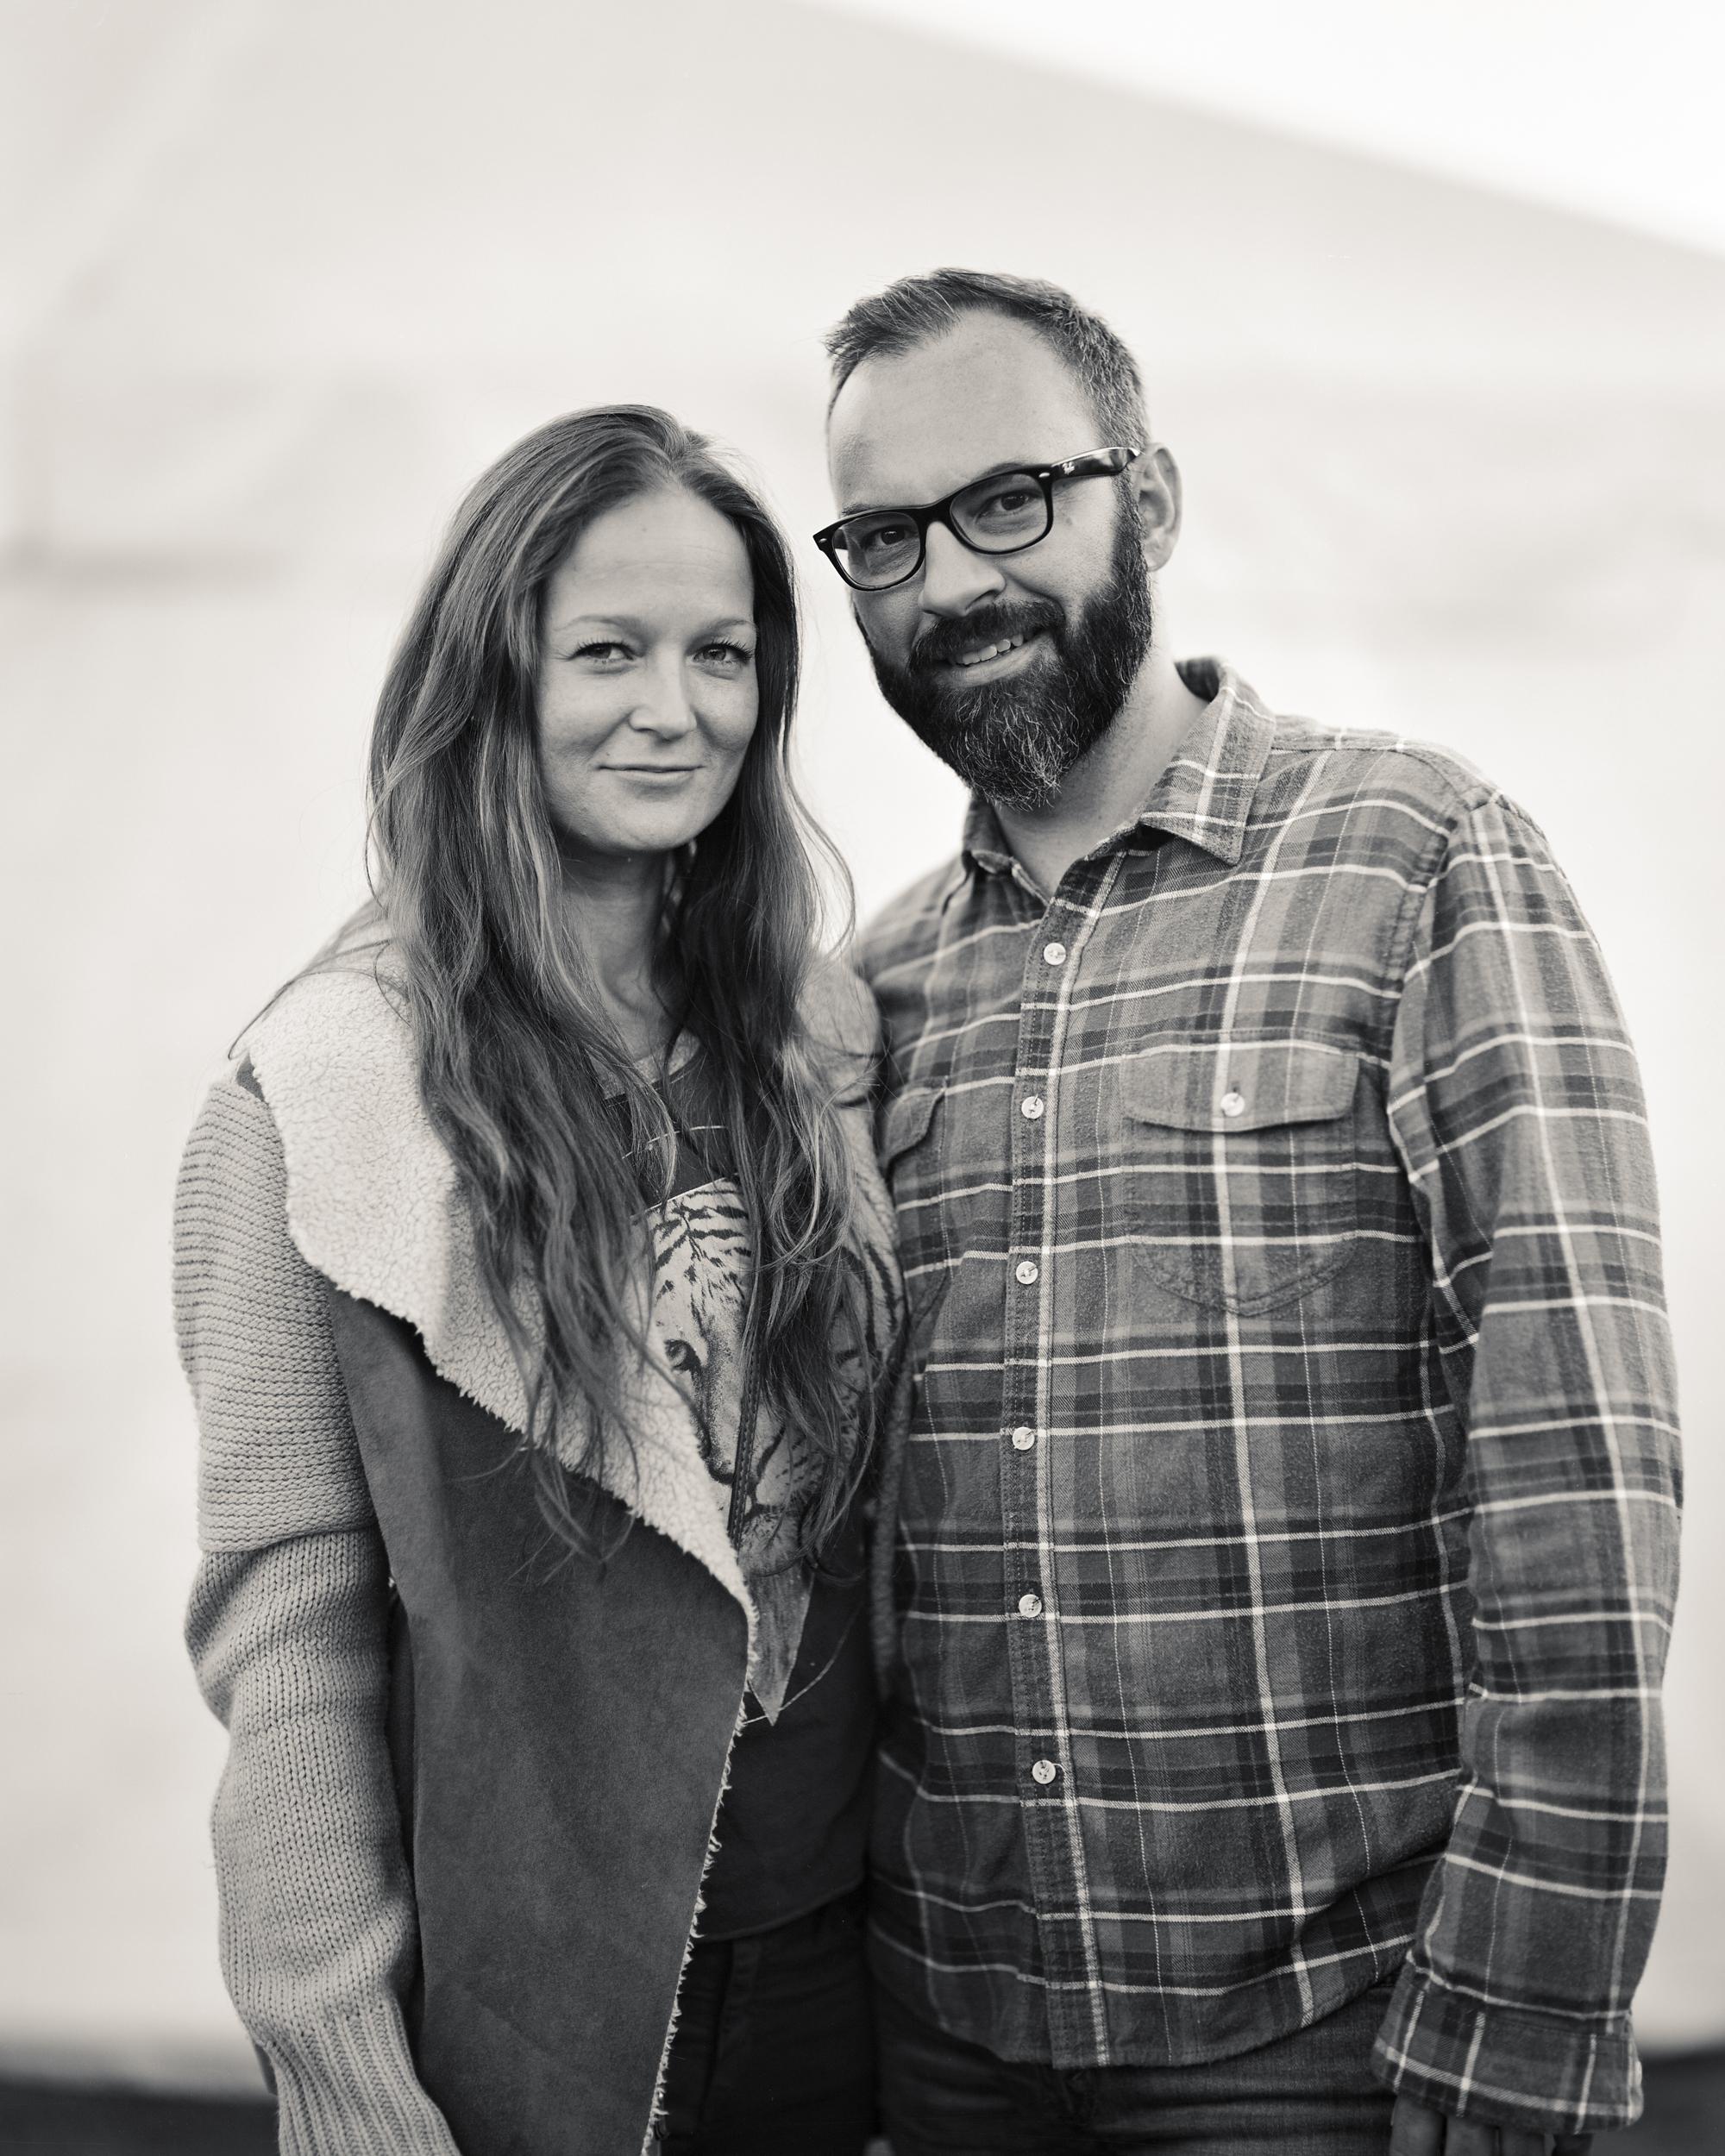 Roddy&Wife002.jpg